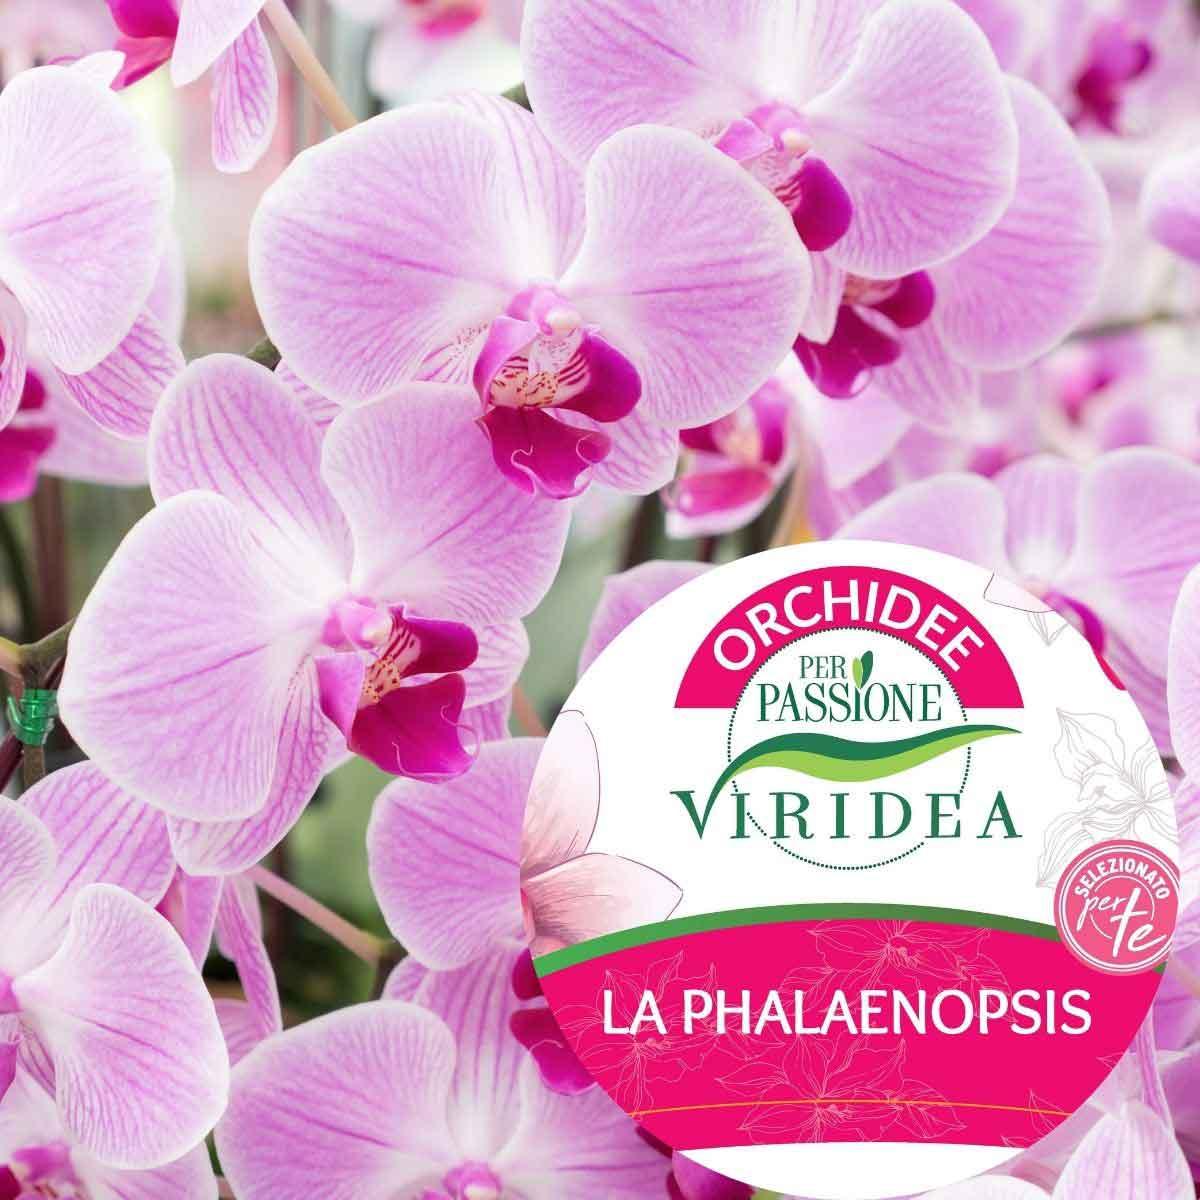 Per Passione – Orchidea Phalaenopsis Multiflora